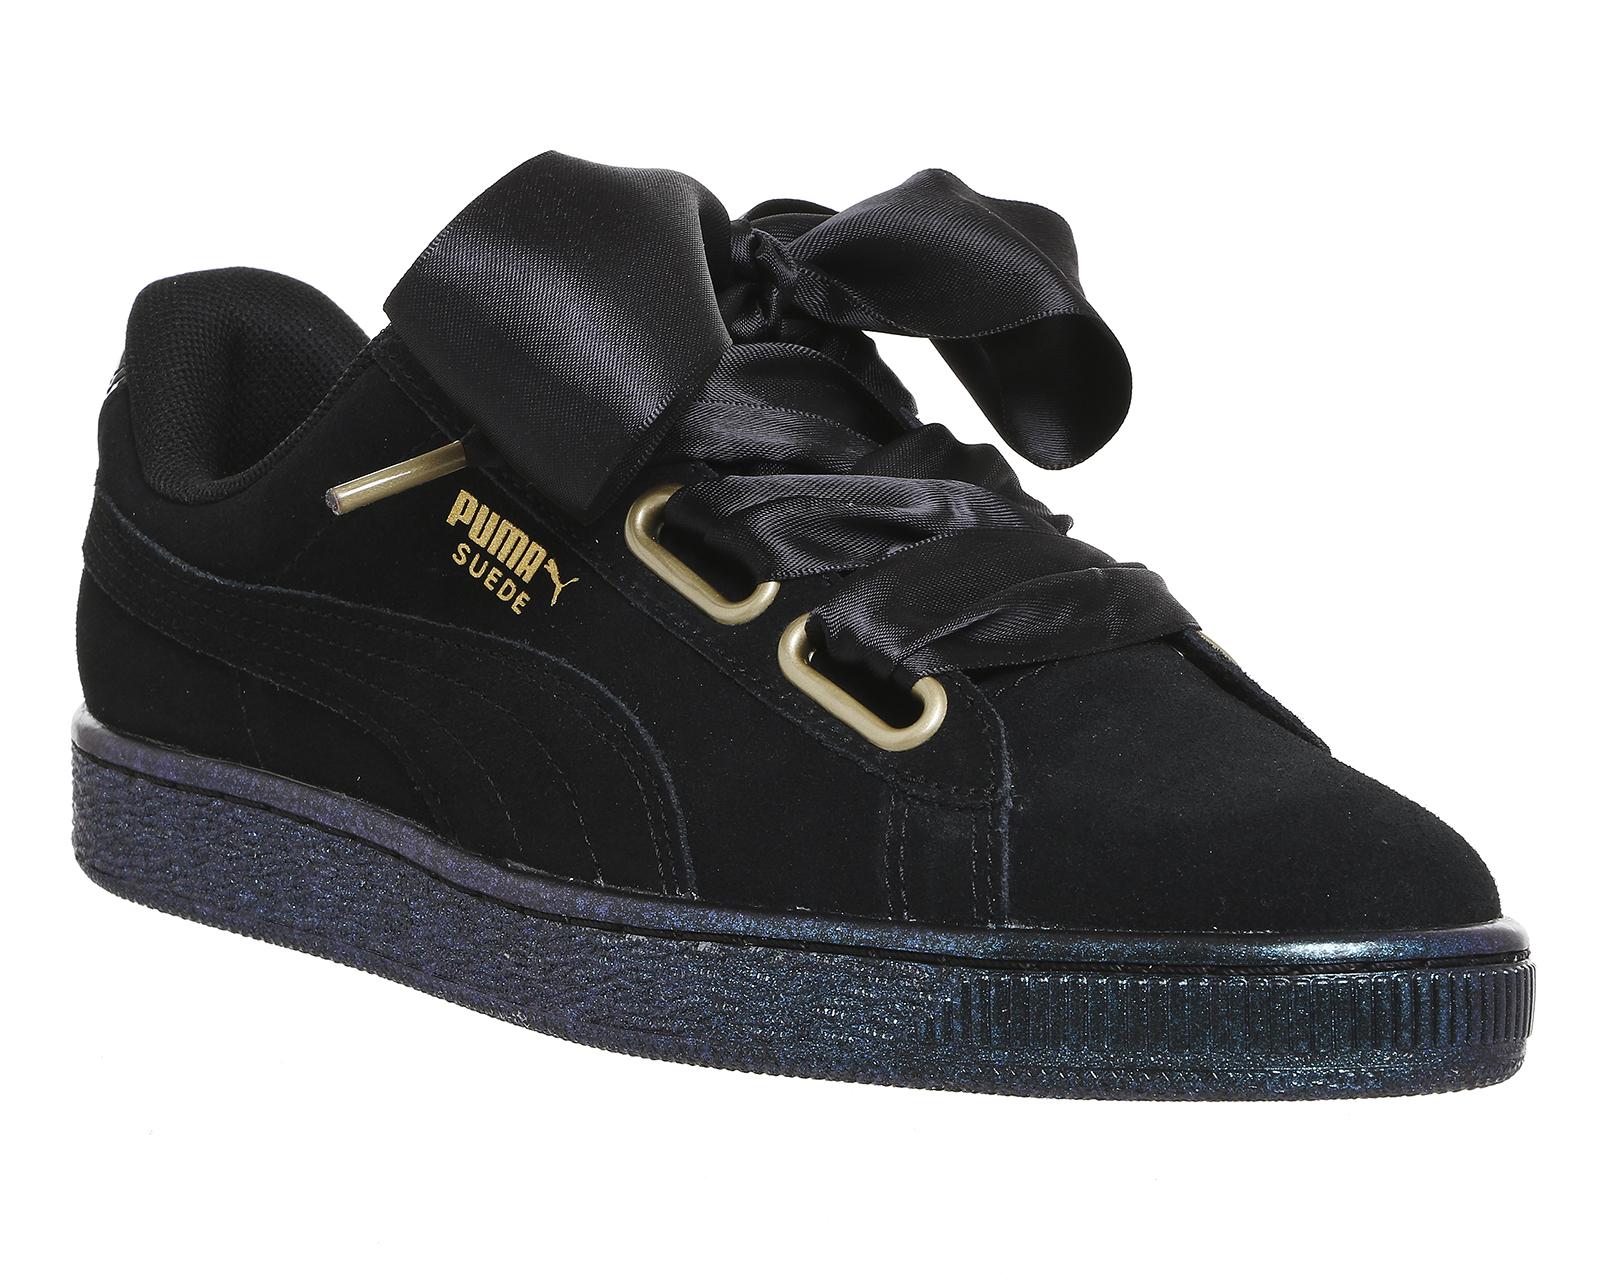 Womens Puma Suede Heart Puma Black Satin Trainers Shoes Ebay